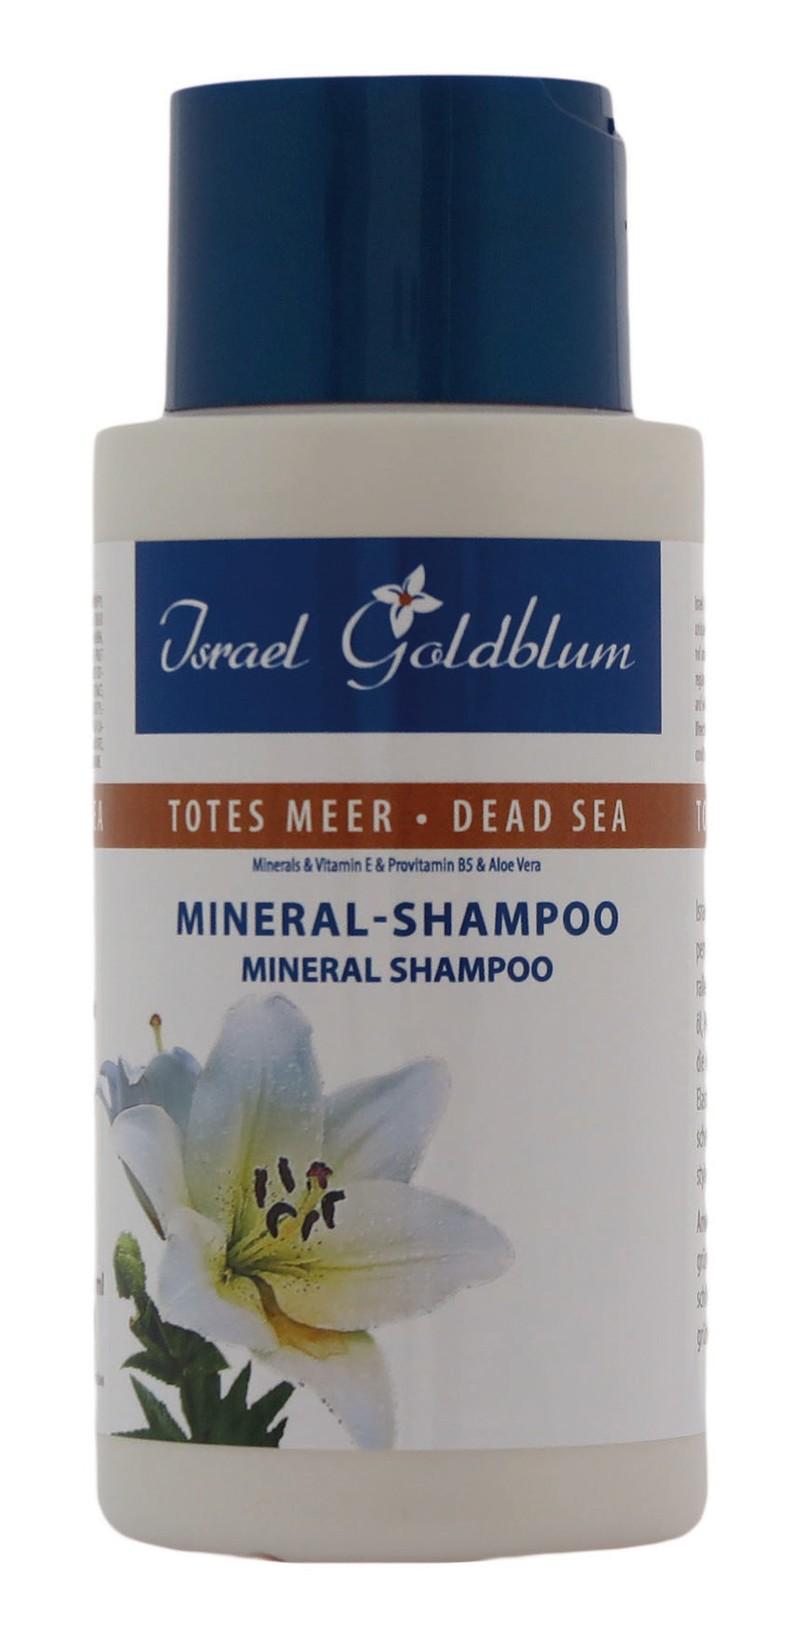 Mineral-Shampoo